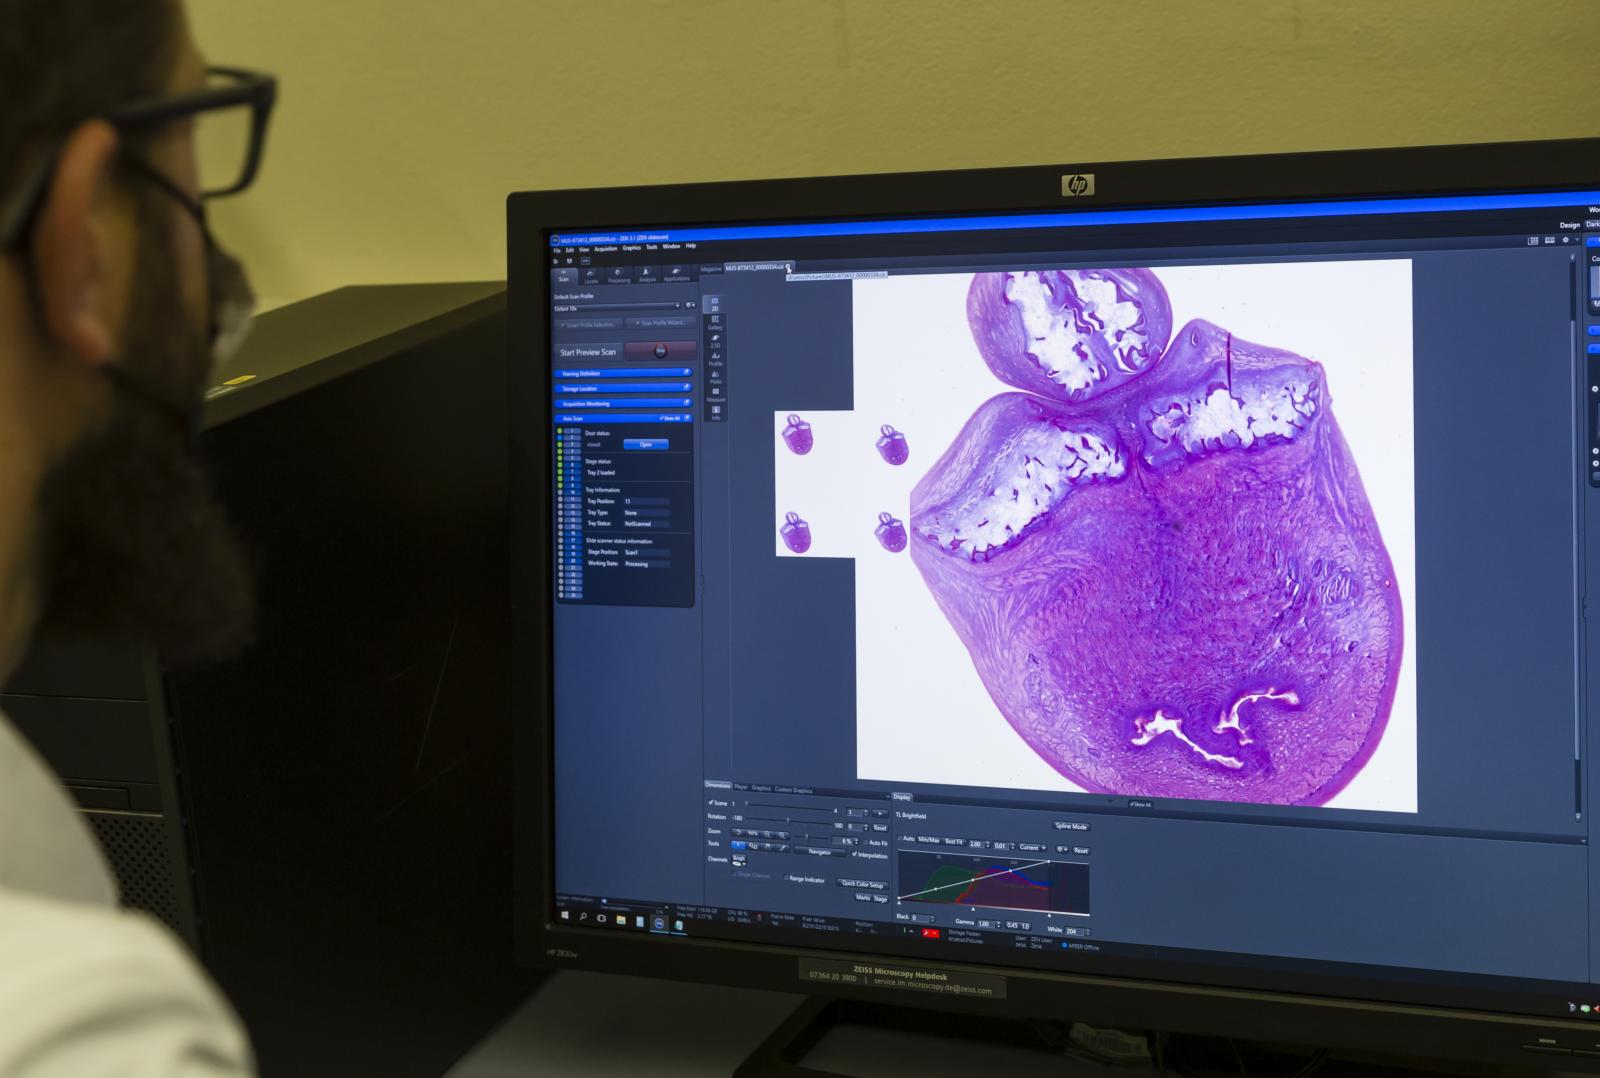 Imaging and digitization of the elephant embryo slides